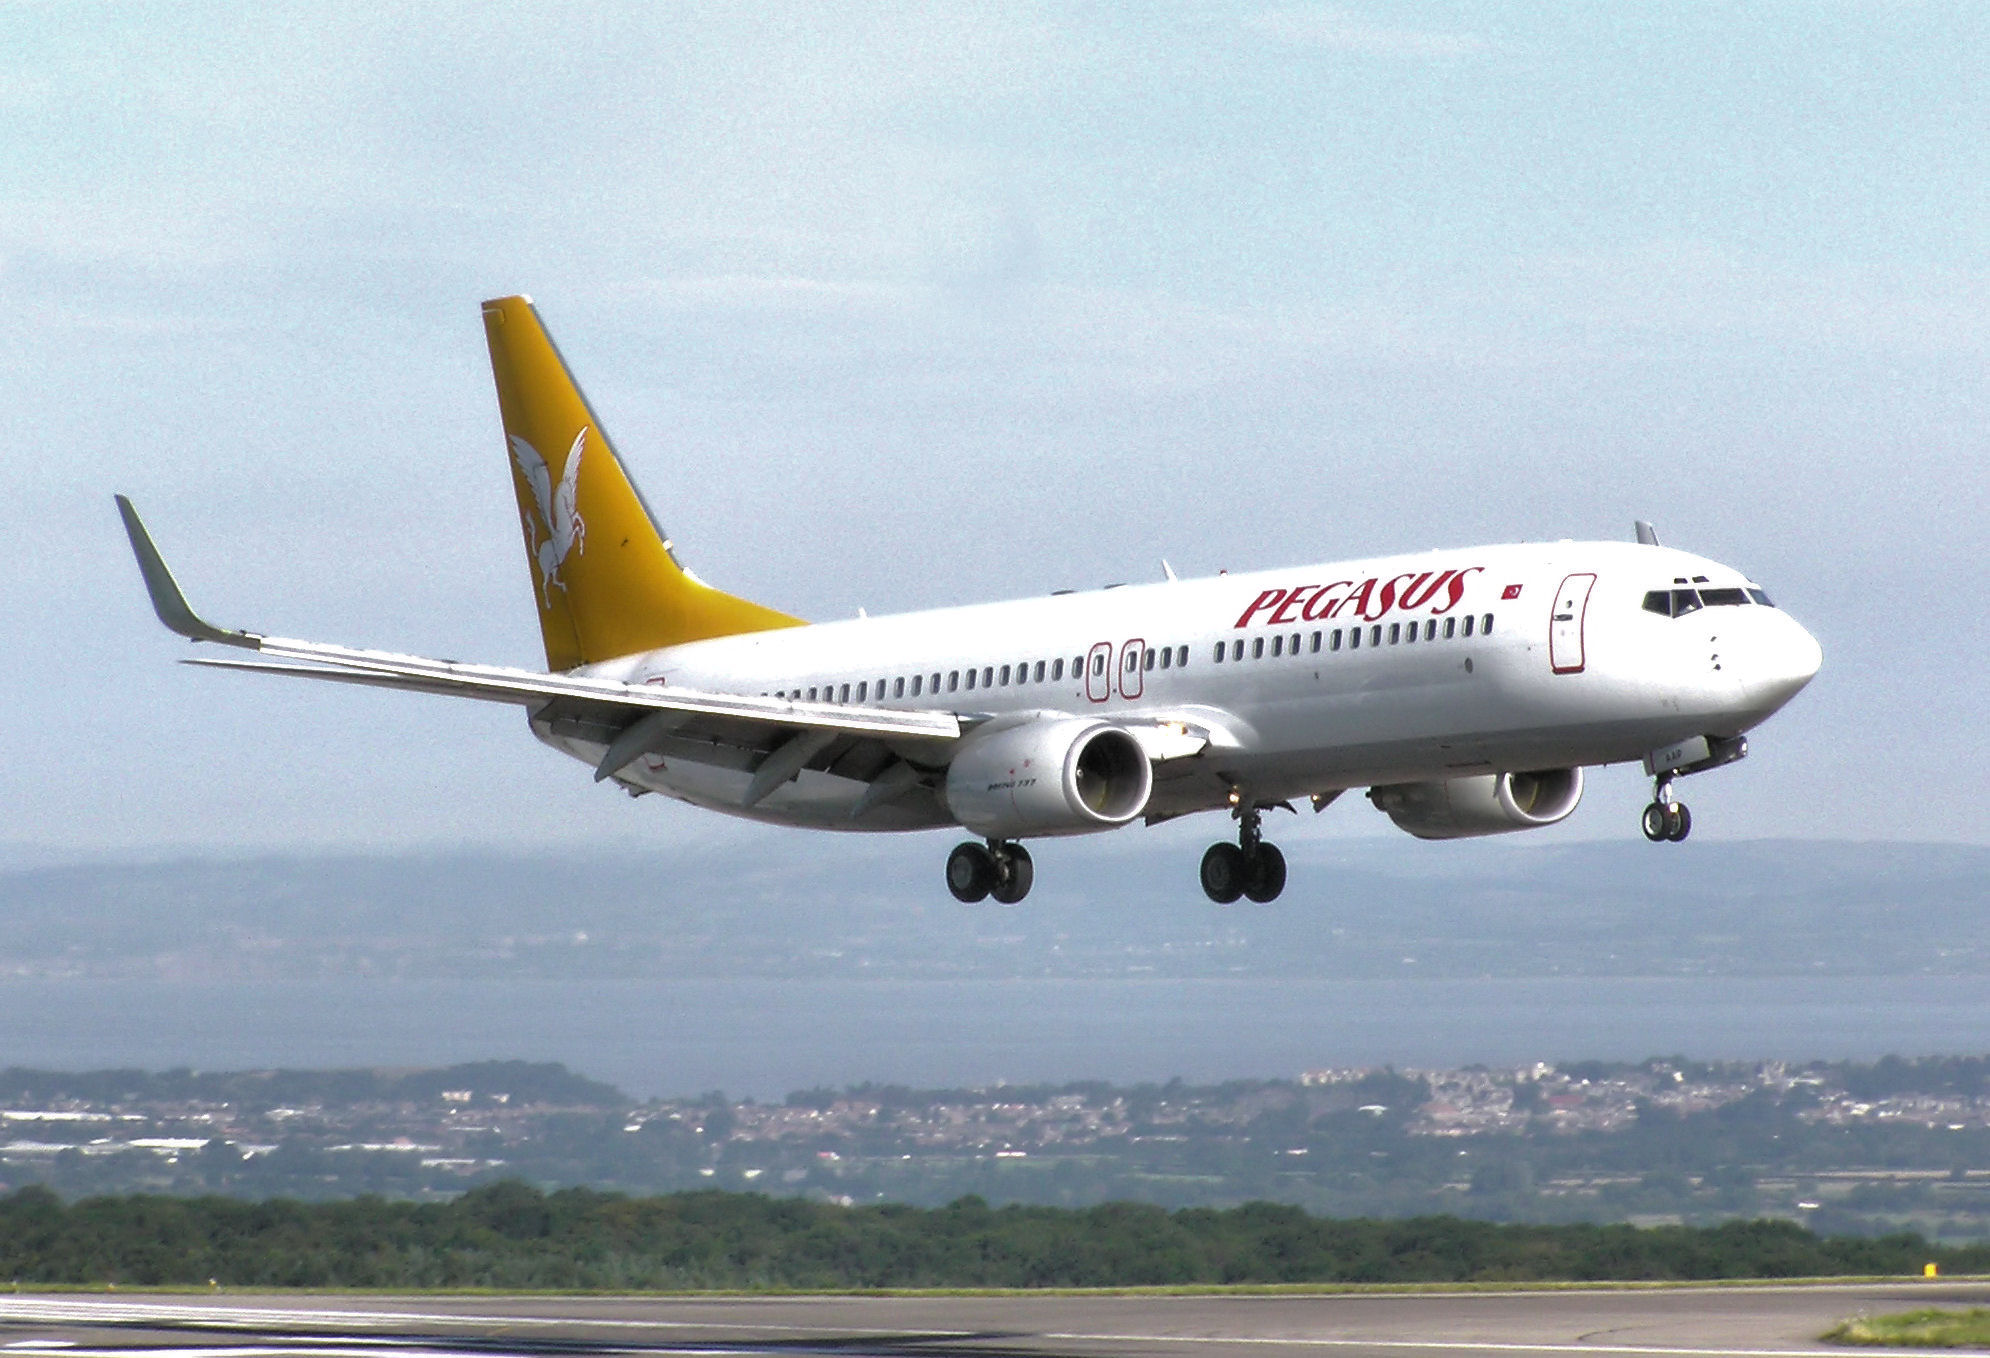 Pegasus uçağı iptal oldu, yolcular tepkili